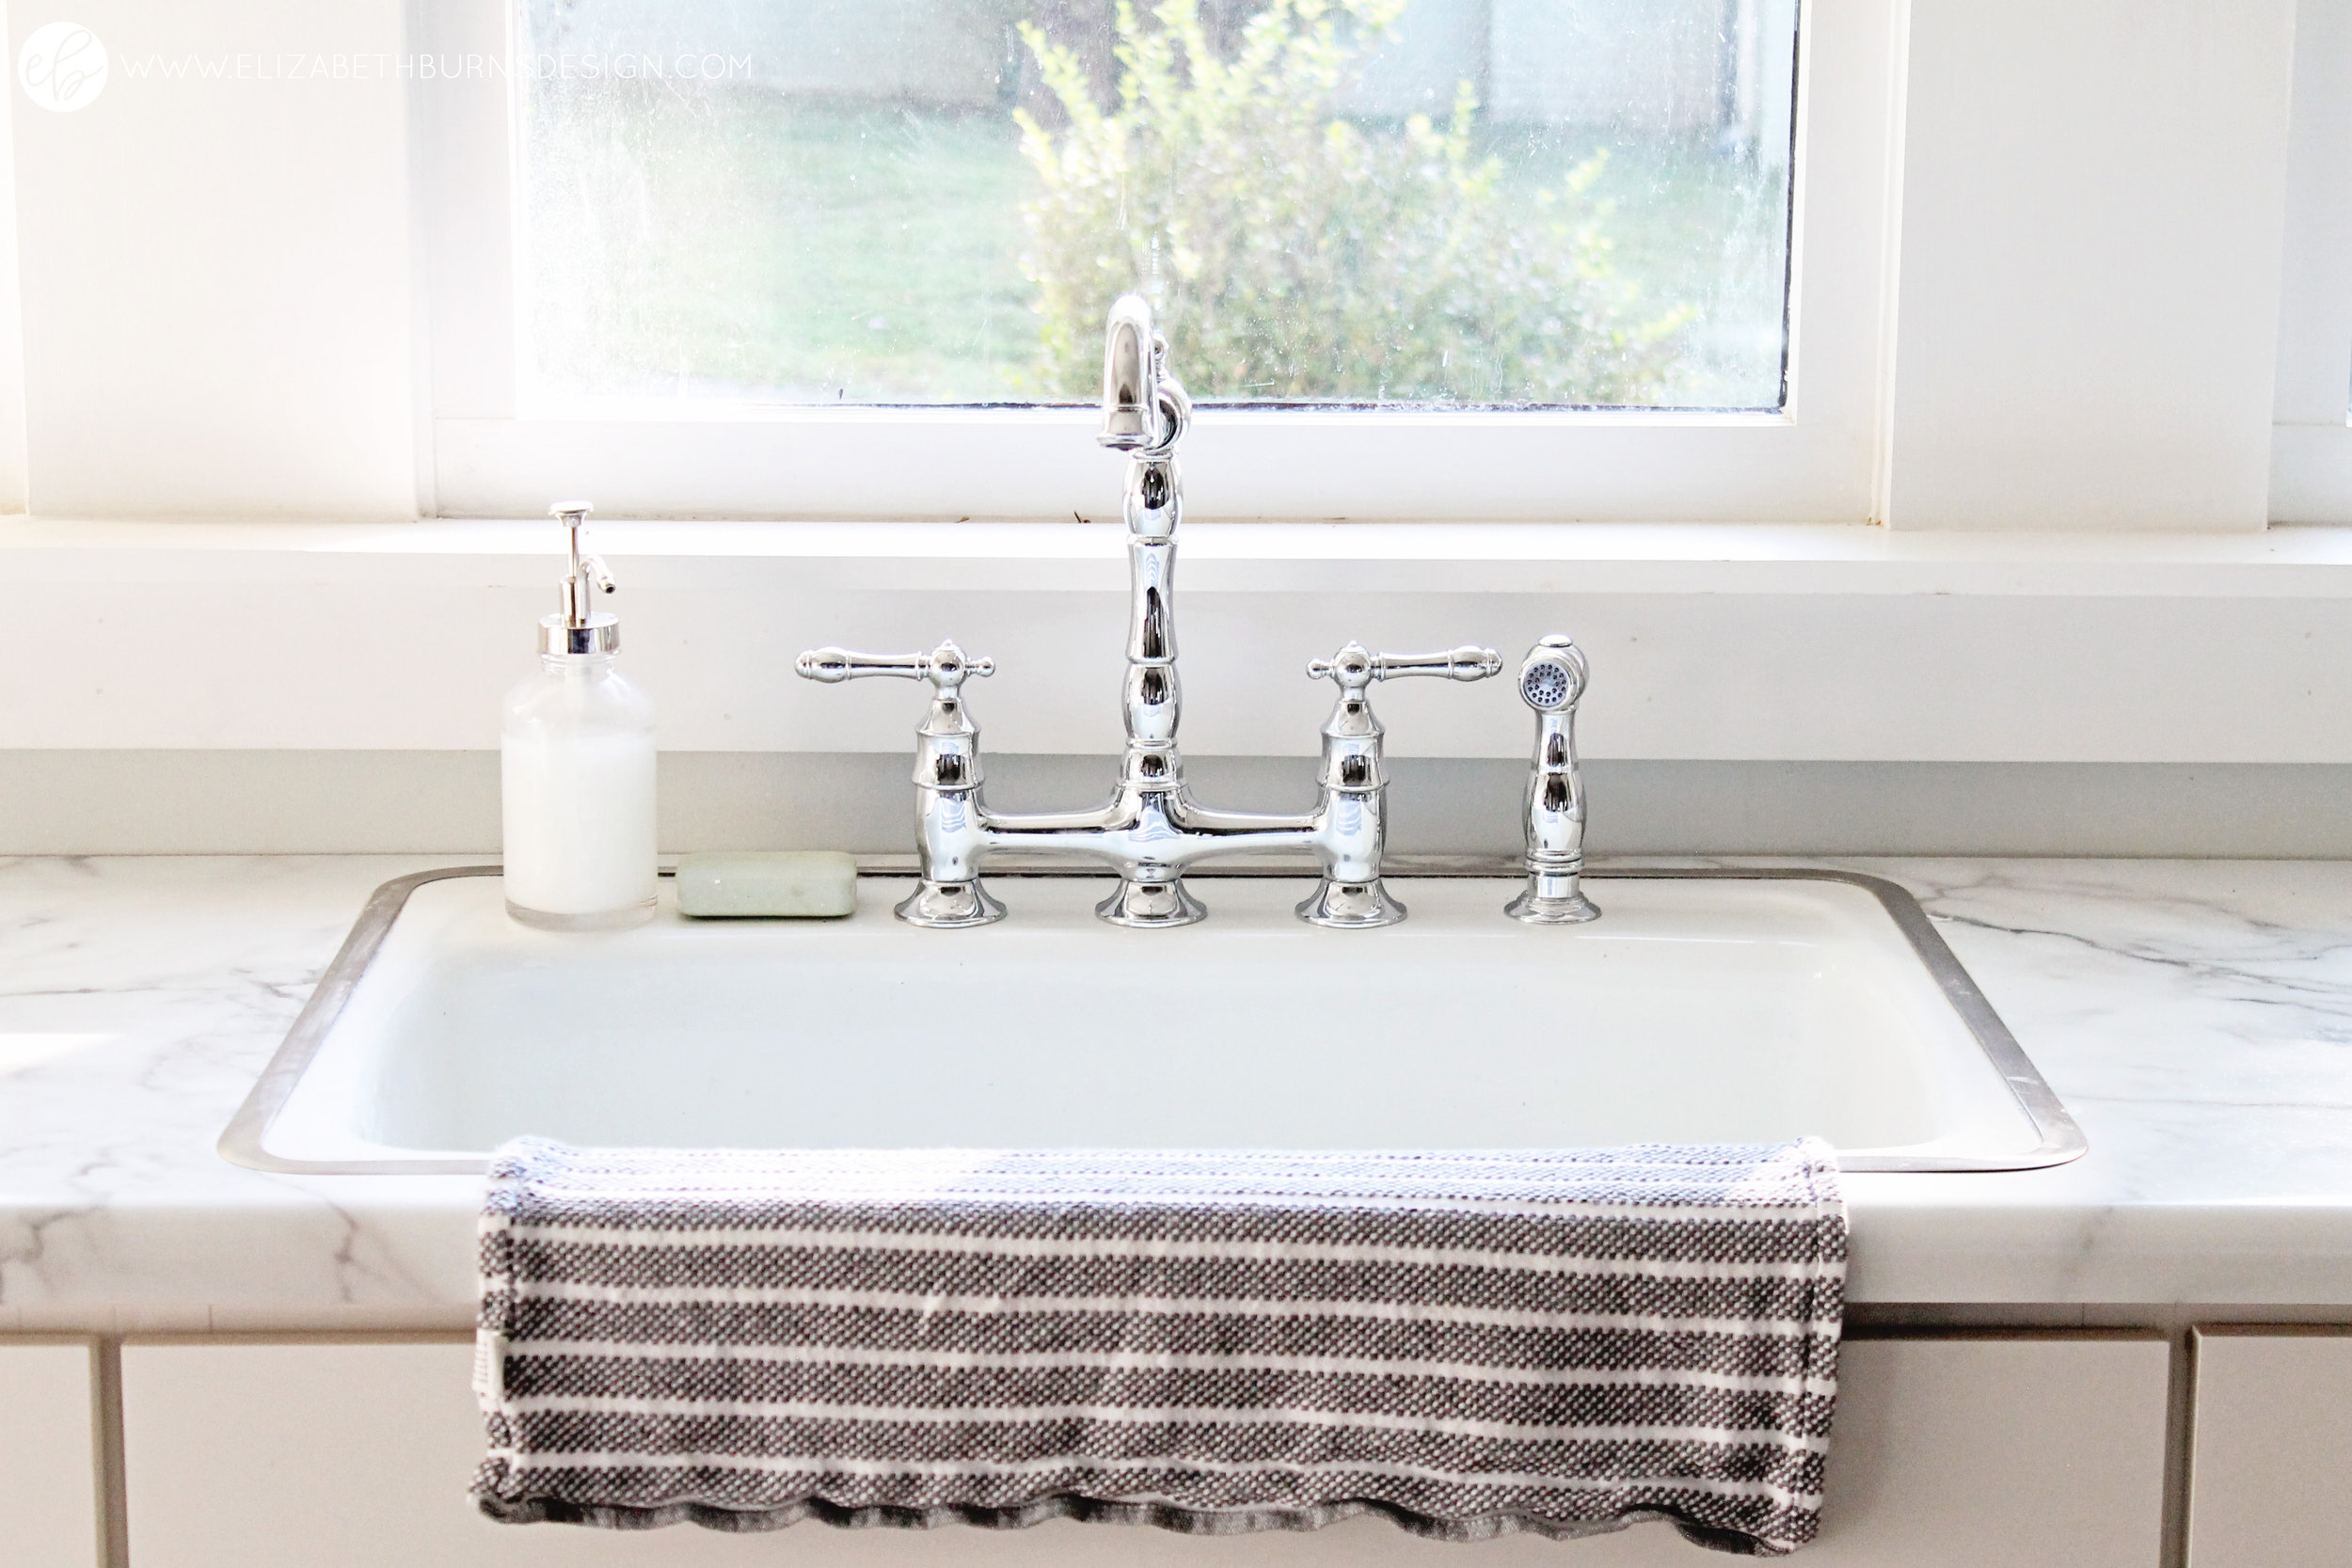 Elizabeth Burns Design   Free Kitchen Sink, Inexpensive Kitchen Renovation, Budget Kitchen Design, Farmhouse Style, Fixer Upper, Sherwin Williams Silver Strand, Chrome Faucet